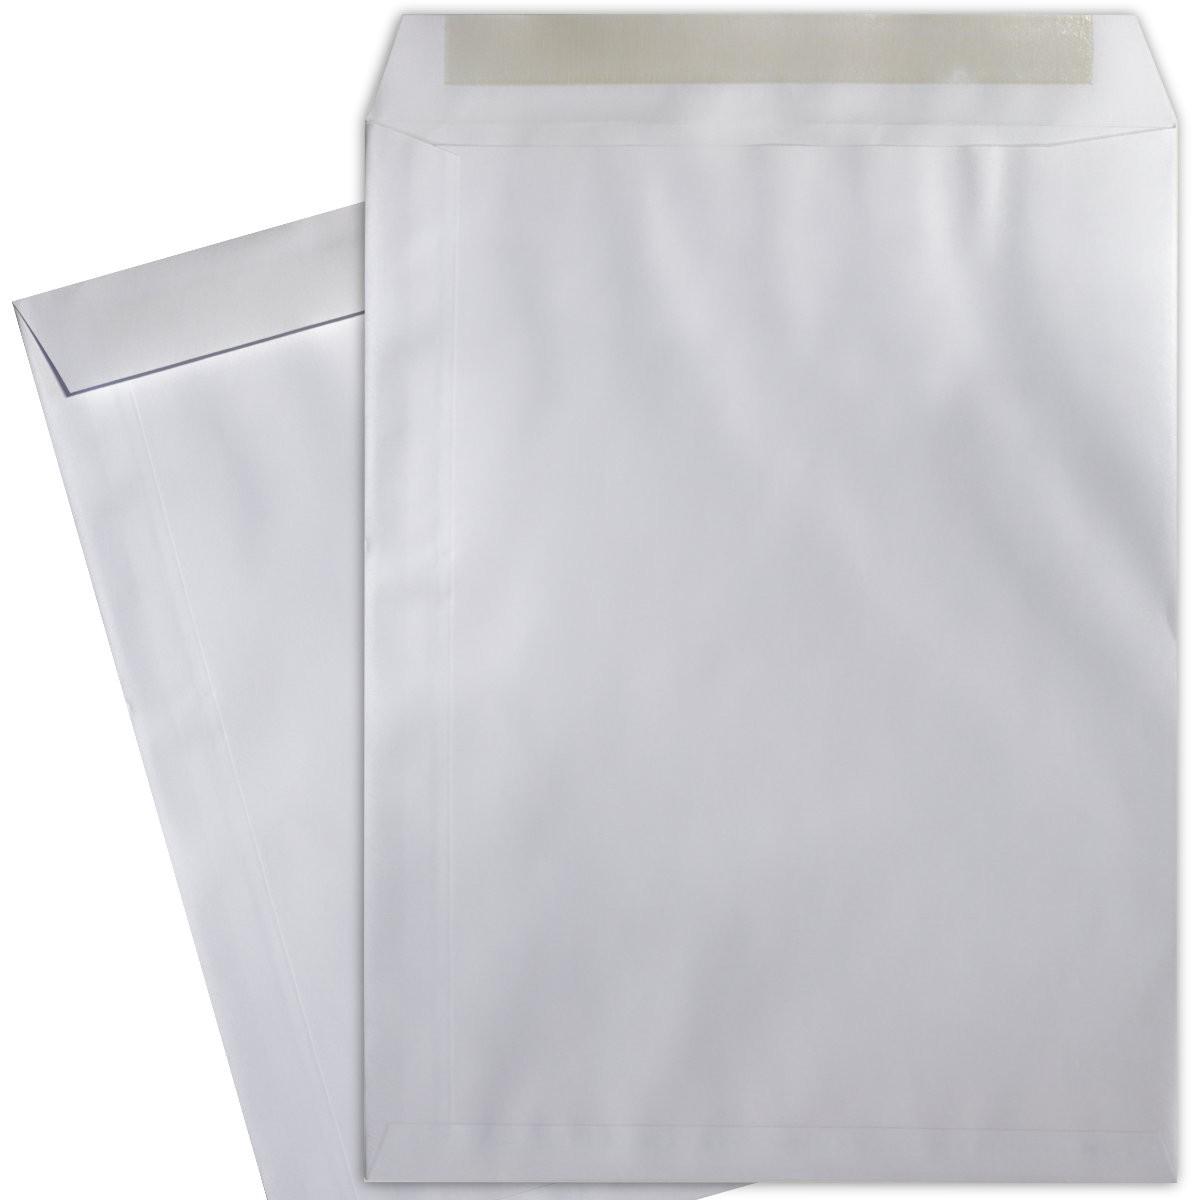 PaperPapers Superbuy Catalog Econo Shipping envelopes Economical White Wove 10-x-13 Bulk 24lb Envelopes 500-pk Mailing Literature and organizing Paperwork